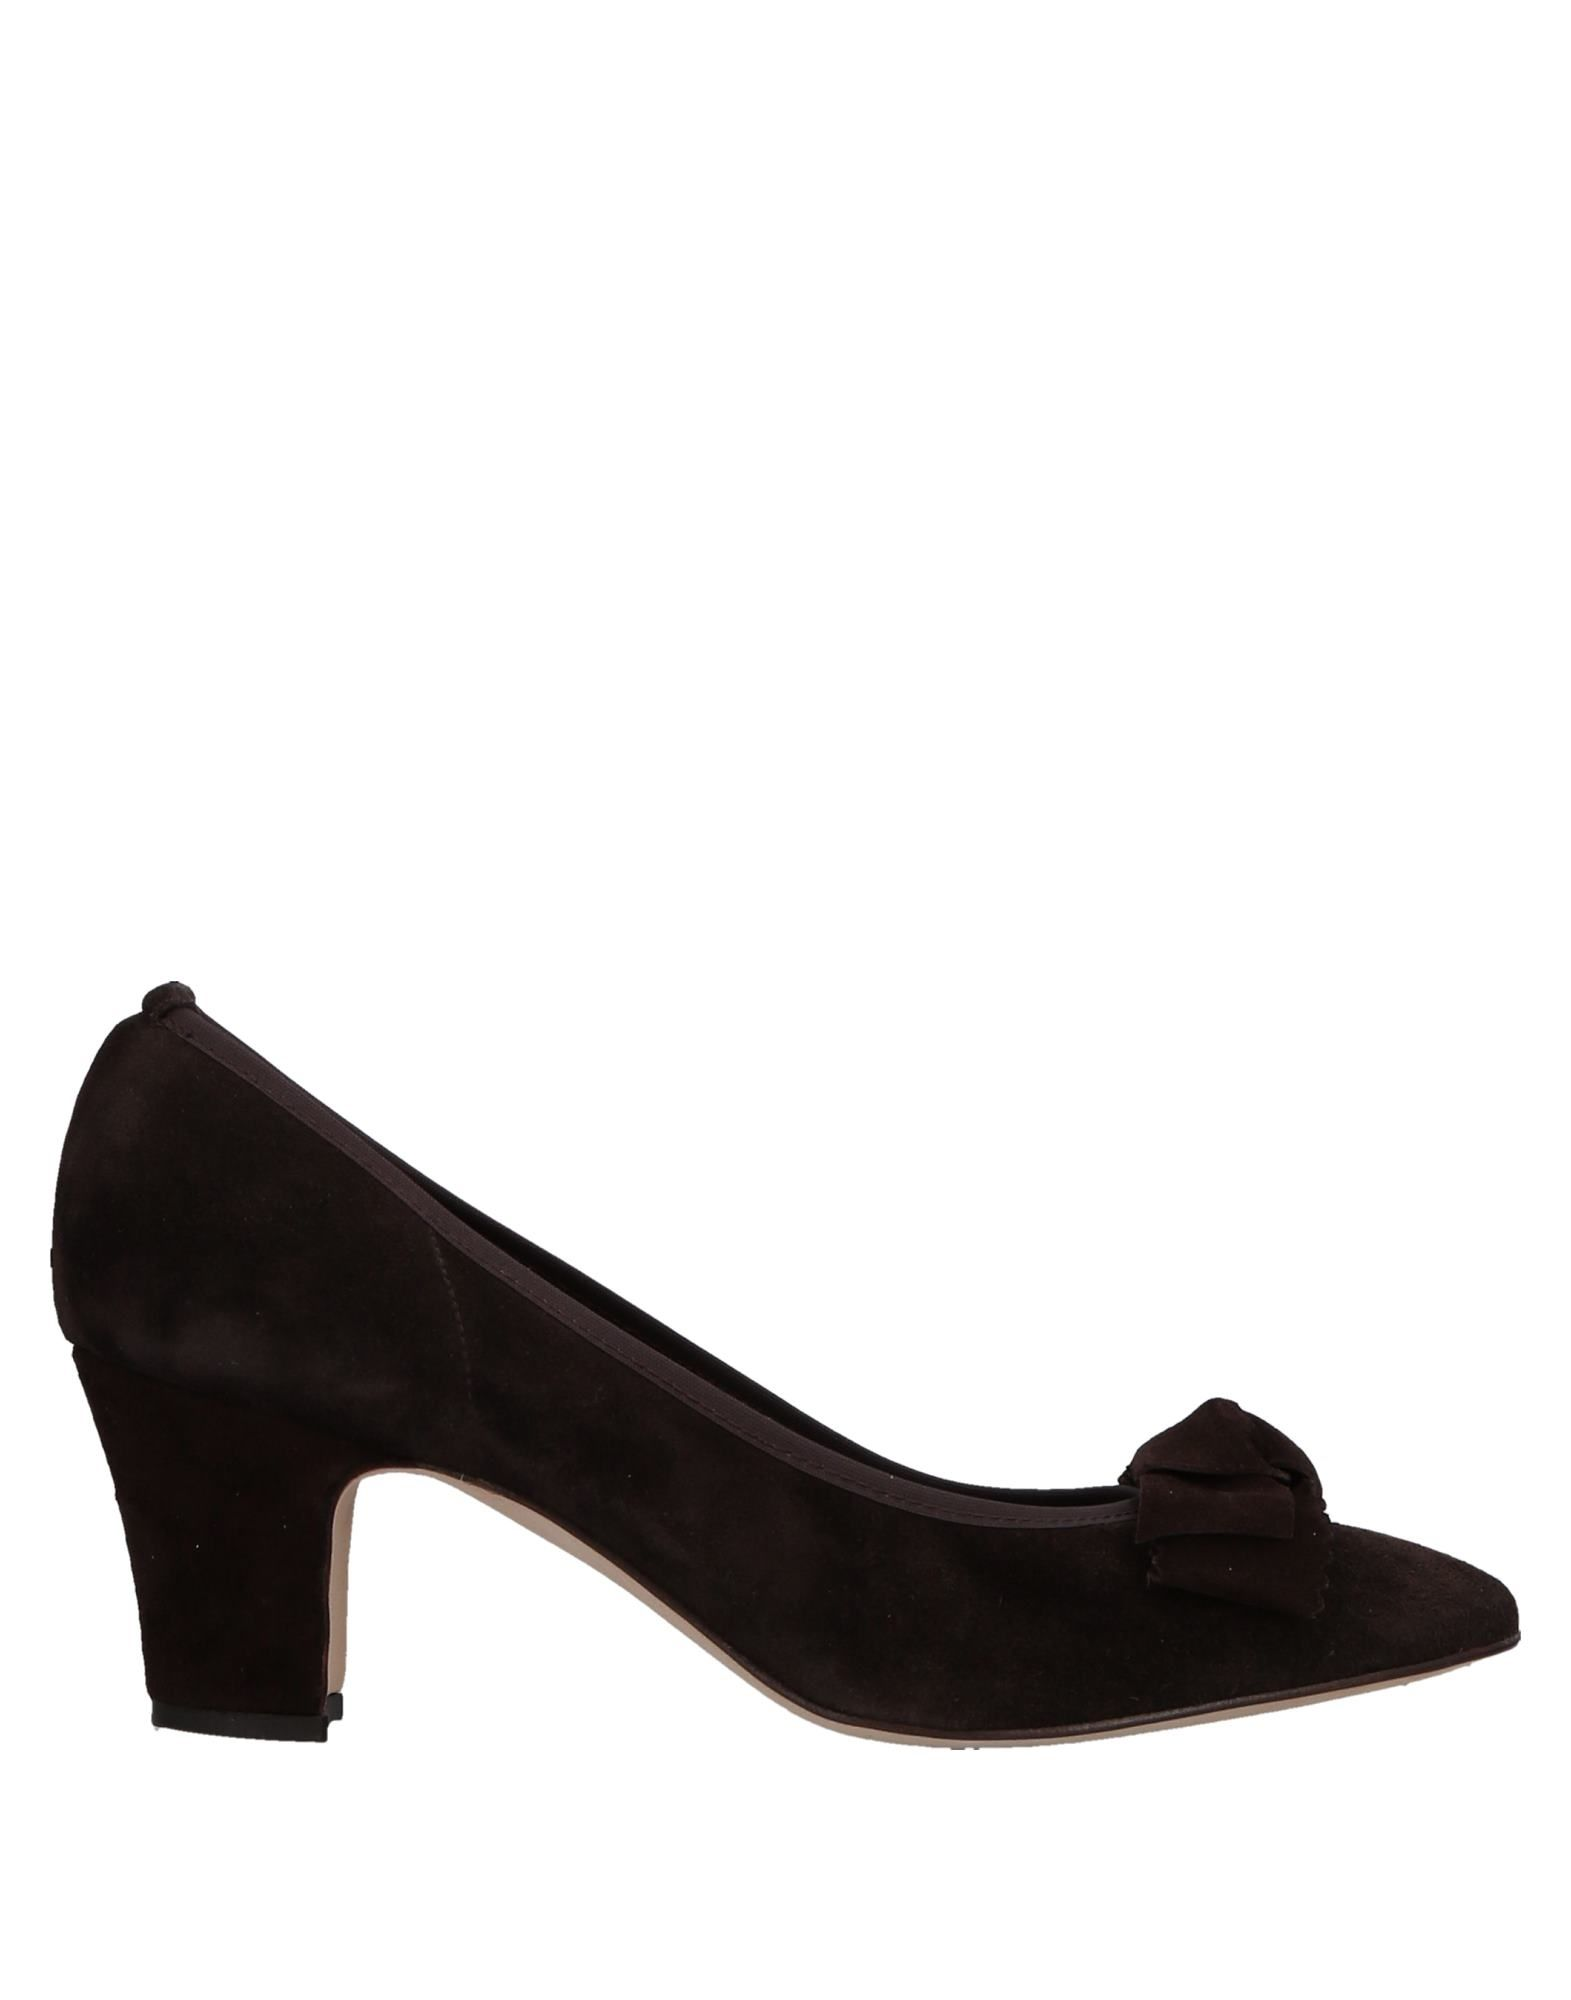 Gut um billige Schuhe zu tragenDaniele Ancarani Pumps Damen  11524210ND